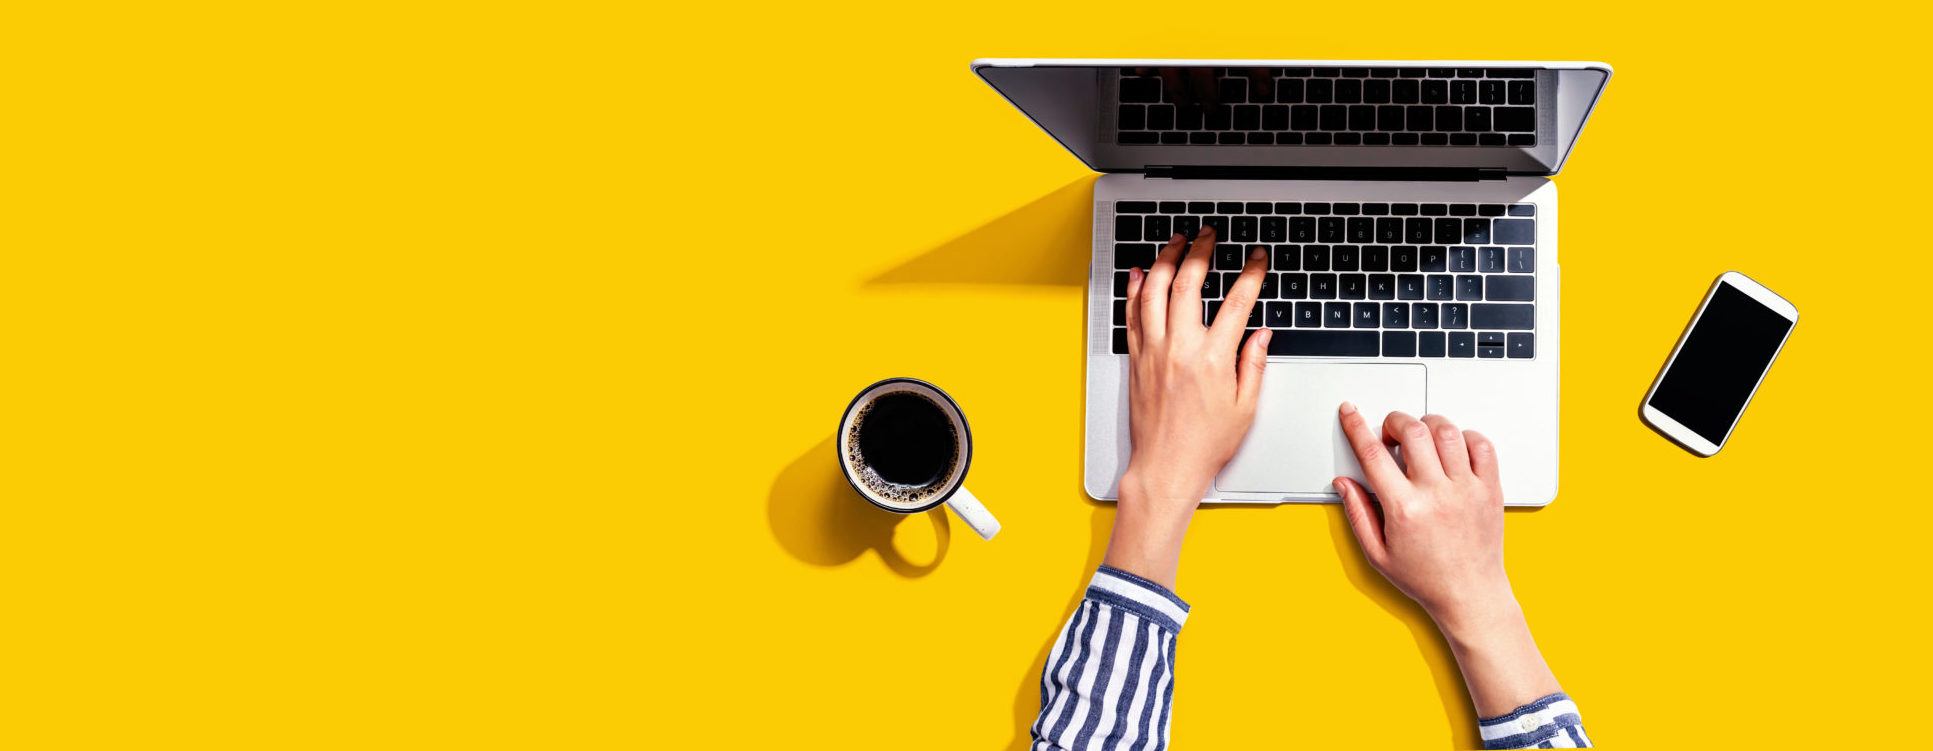 Create your own website ทำเว็บไซต์เอง